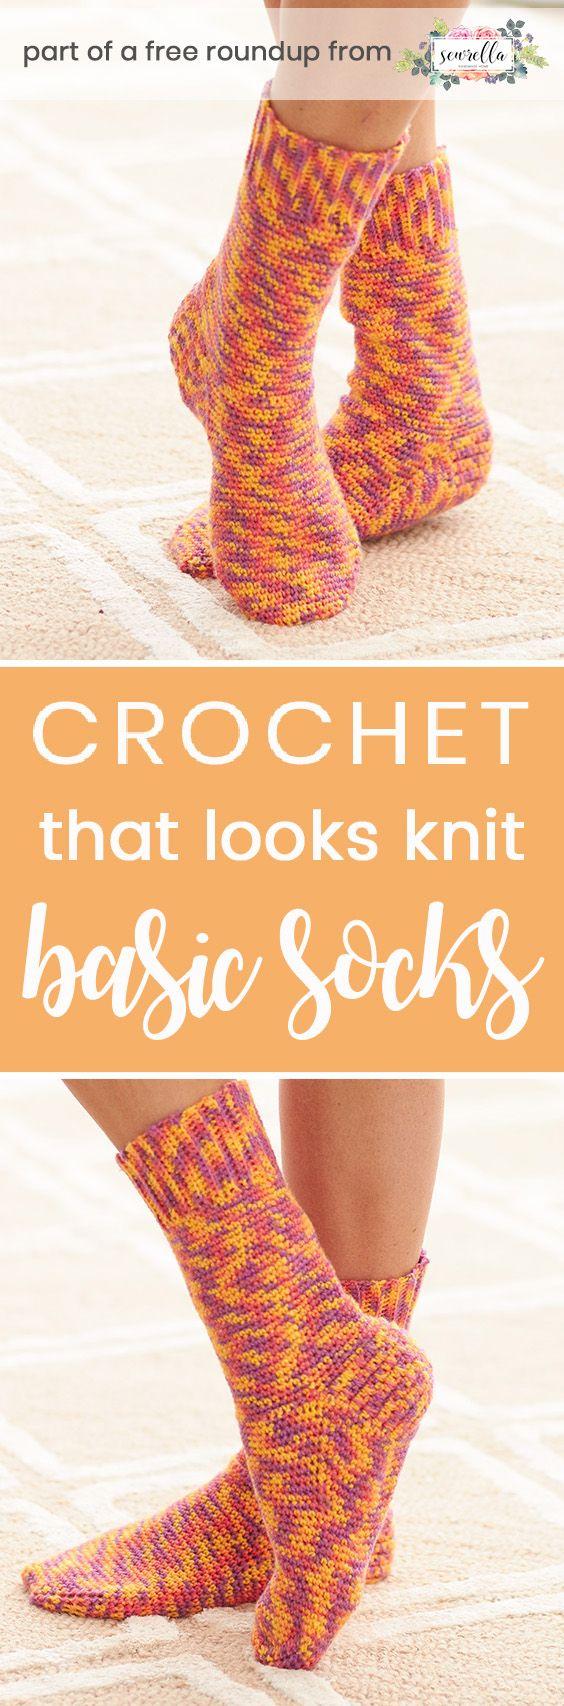 Crochet accessories that look knit crochet accessories free crochet accessories that look knit crochet accessories free pattern and socks bankloansurffo Gallery